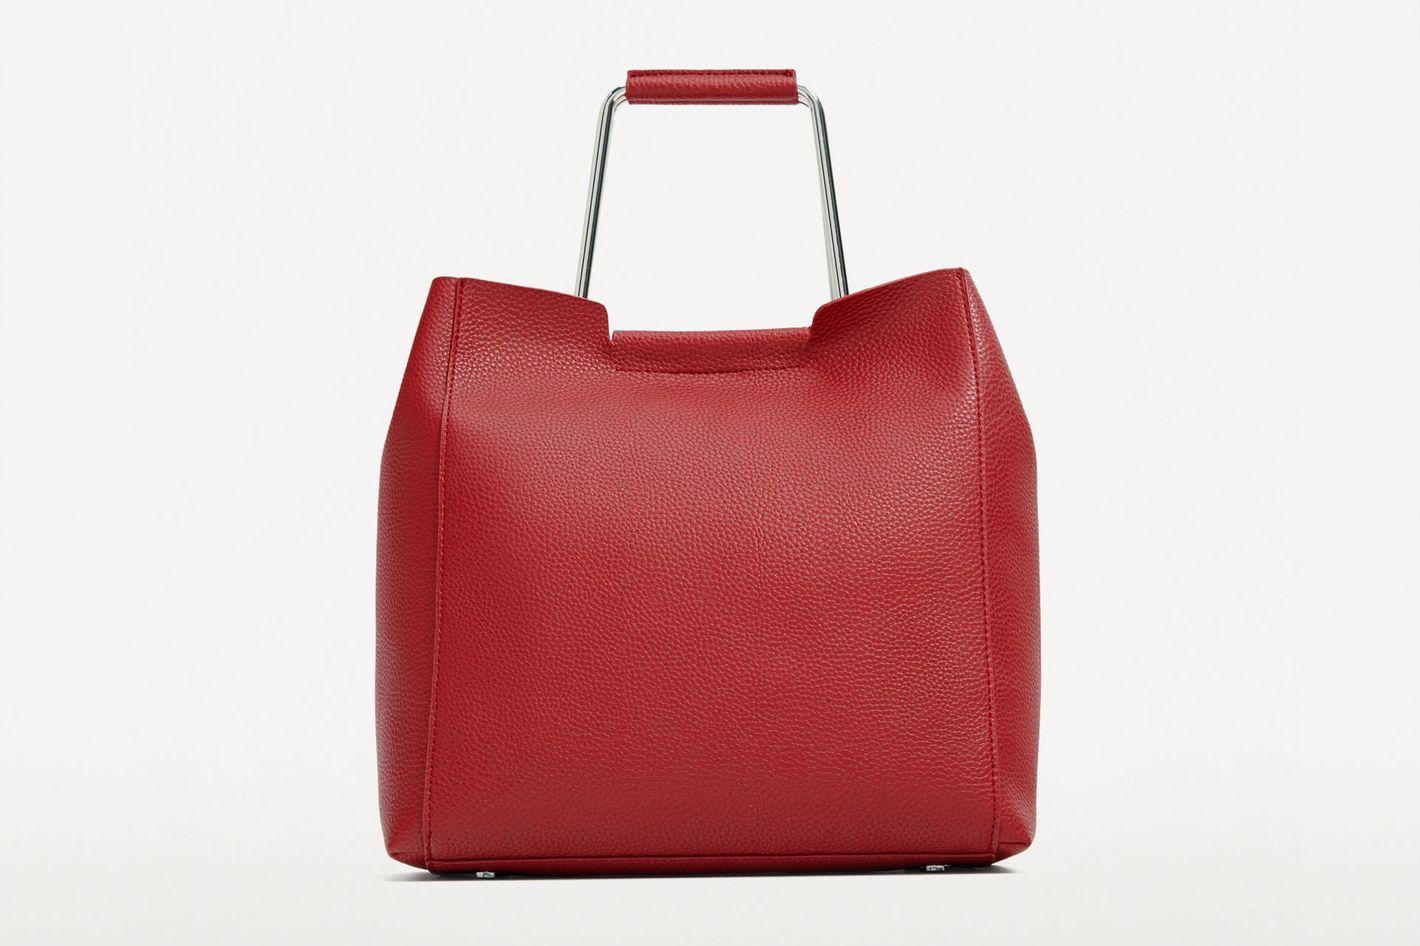 Zara Soft Tote Bag with Metallic Handles